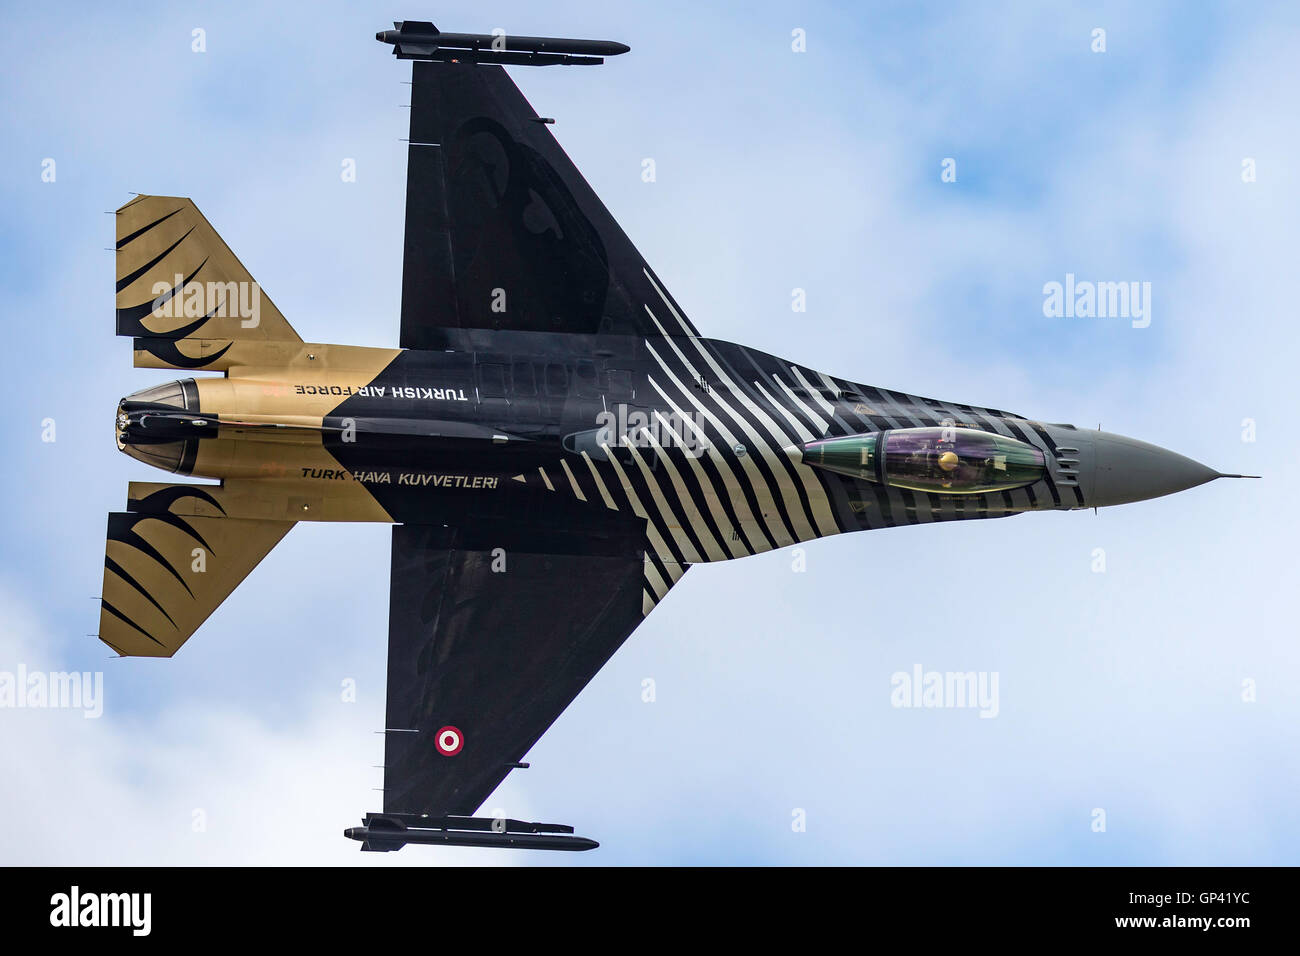 Turkish Air Force (Türk Hava Kuvvetleri) General Dynamics F-16CG jet known as 'Solo Turk'. - Stock Image